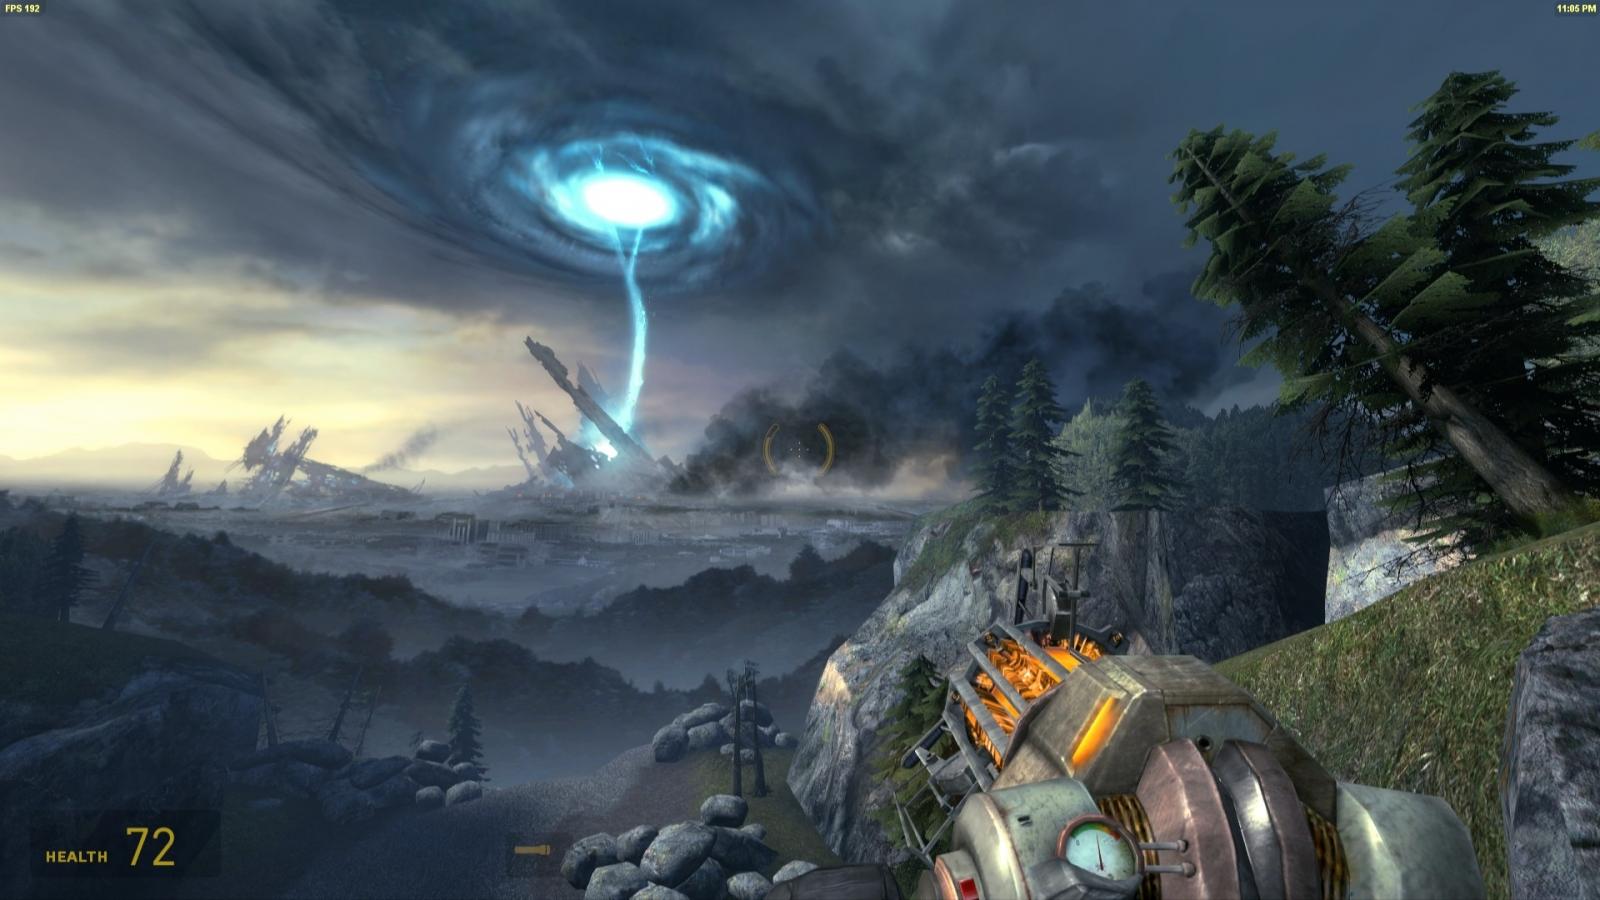 half life 2 pc game free download full version